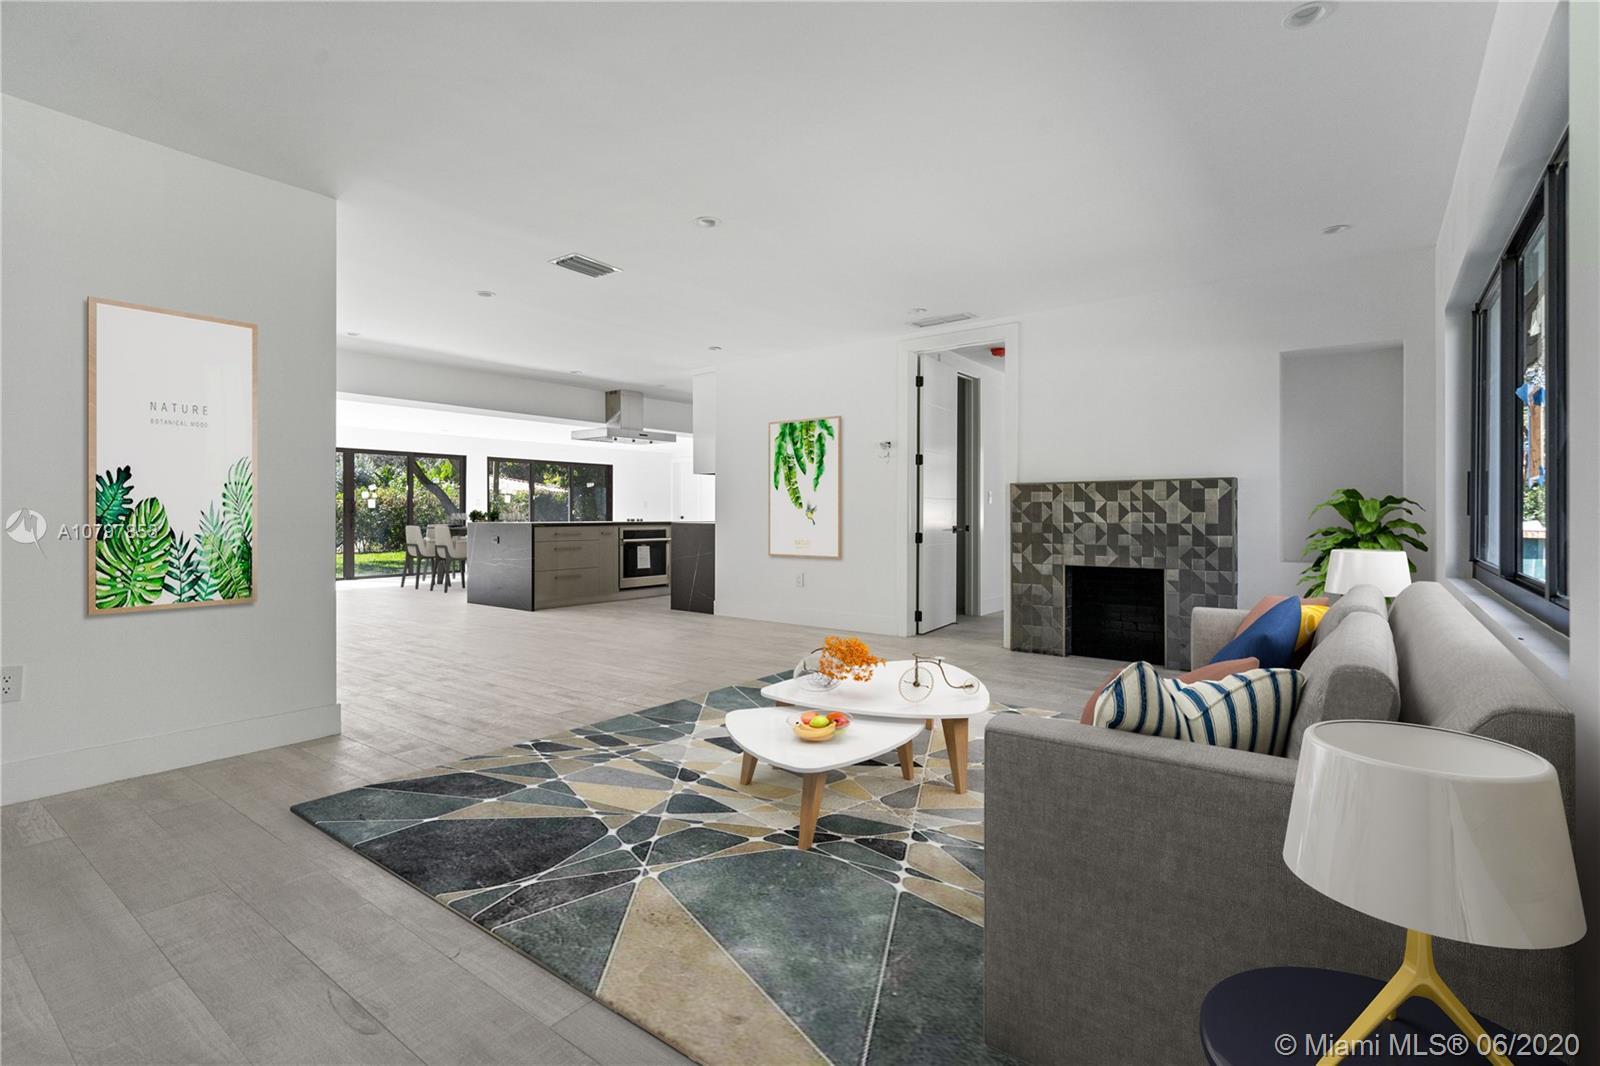 Home Interior of Living